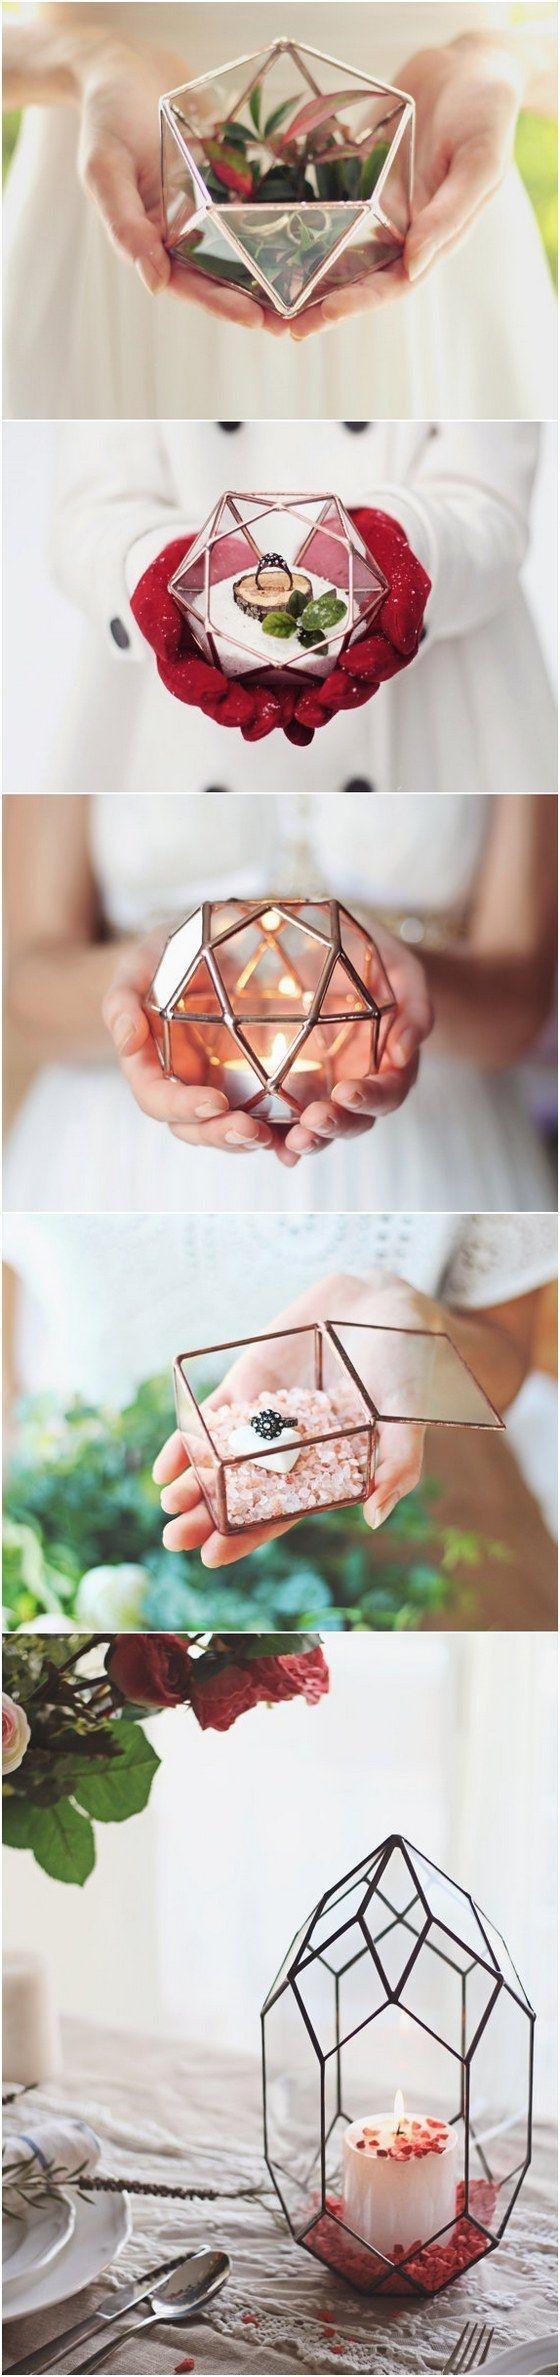 Handmade Geometric Glassware / Glass Geometric Candle Holder / Wedding Candles / Wedding Lights / Geometric Ring Bearer Box / Glass Ring Pillow / Wedding Ring Box